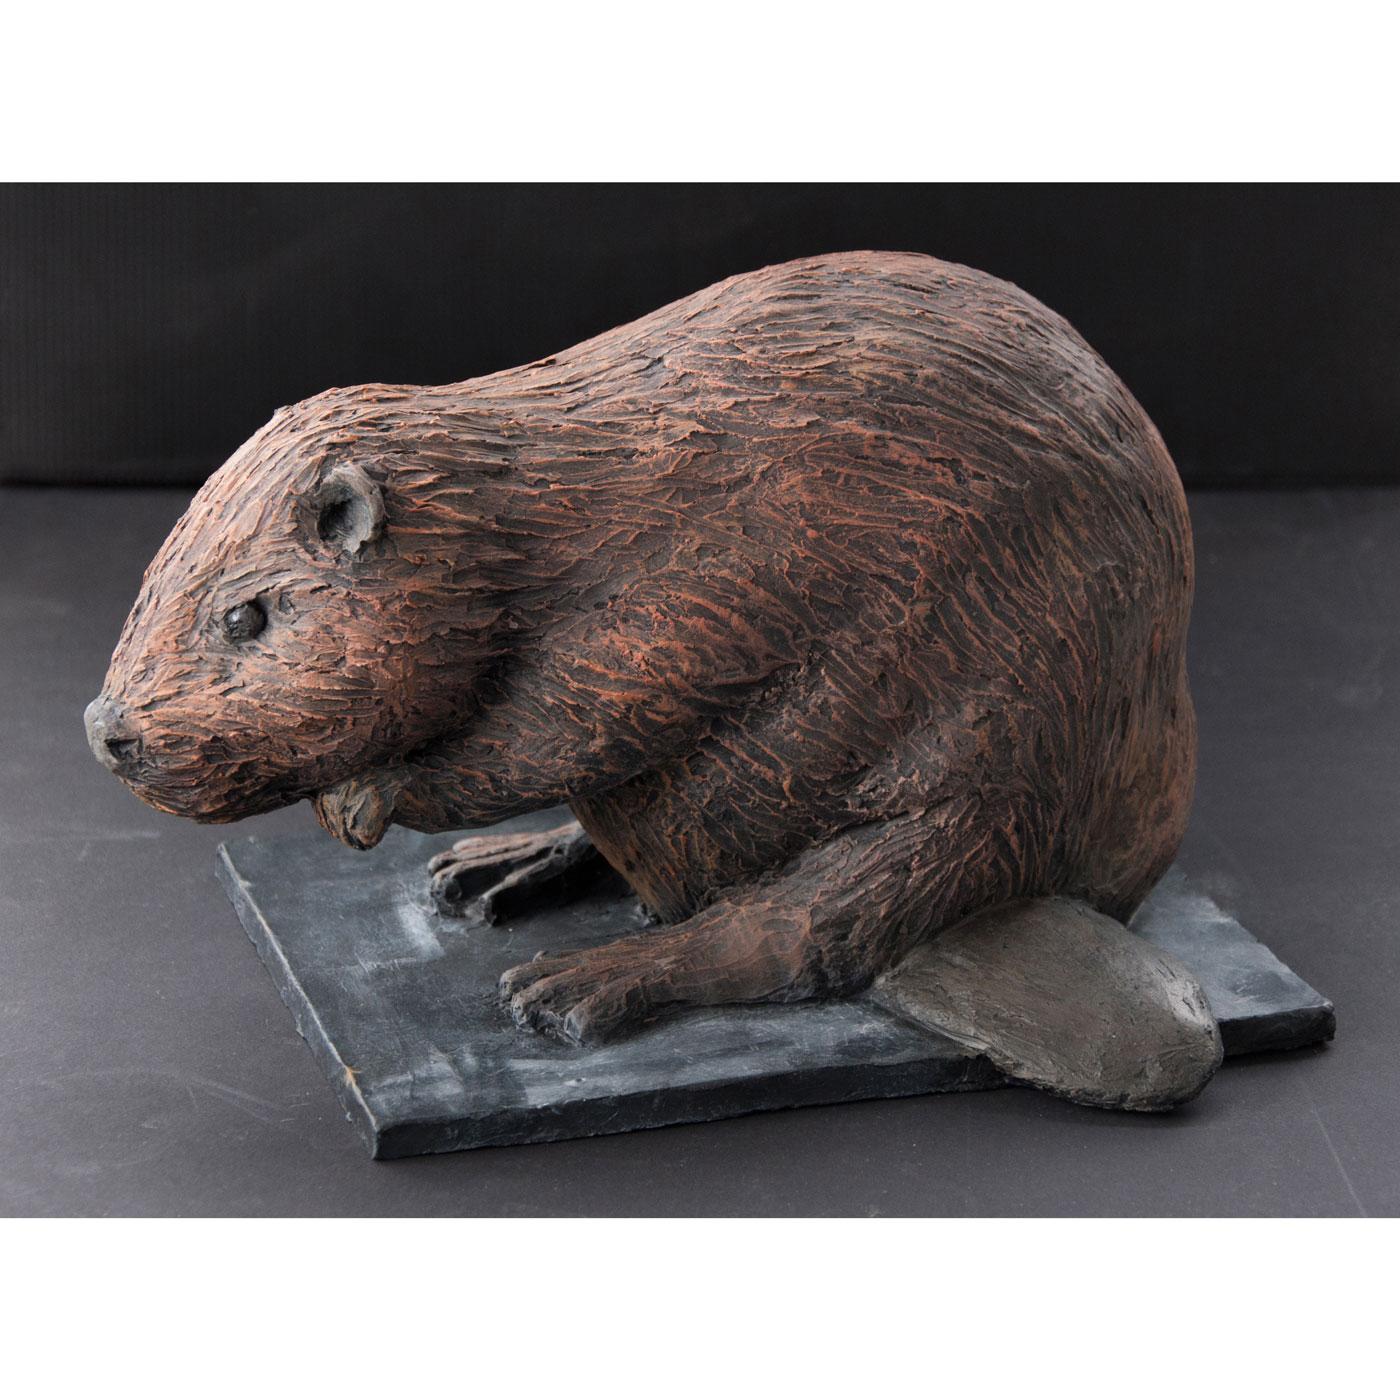 BEAVER,  © 2014, acrylic cast, molded in wax, 20 x 20 x 30 cm